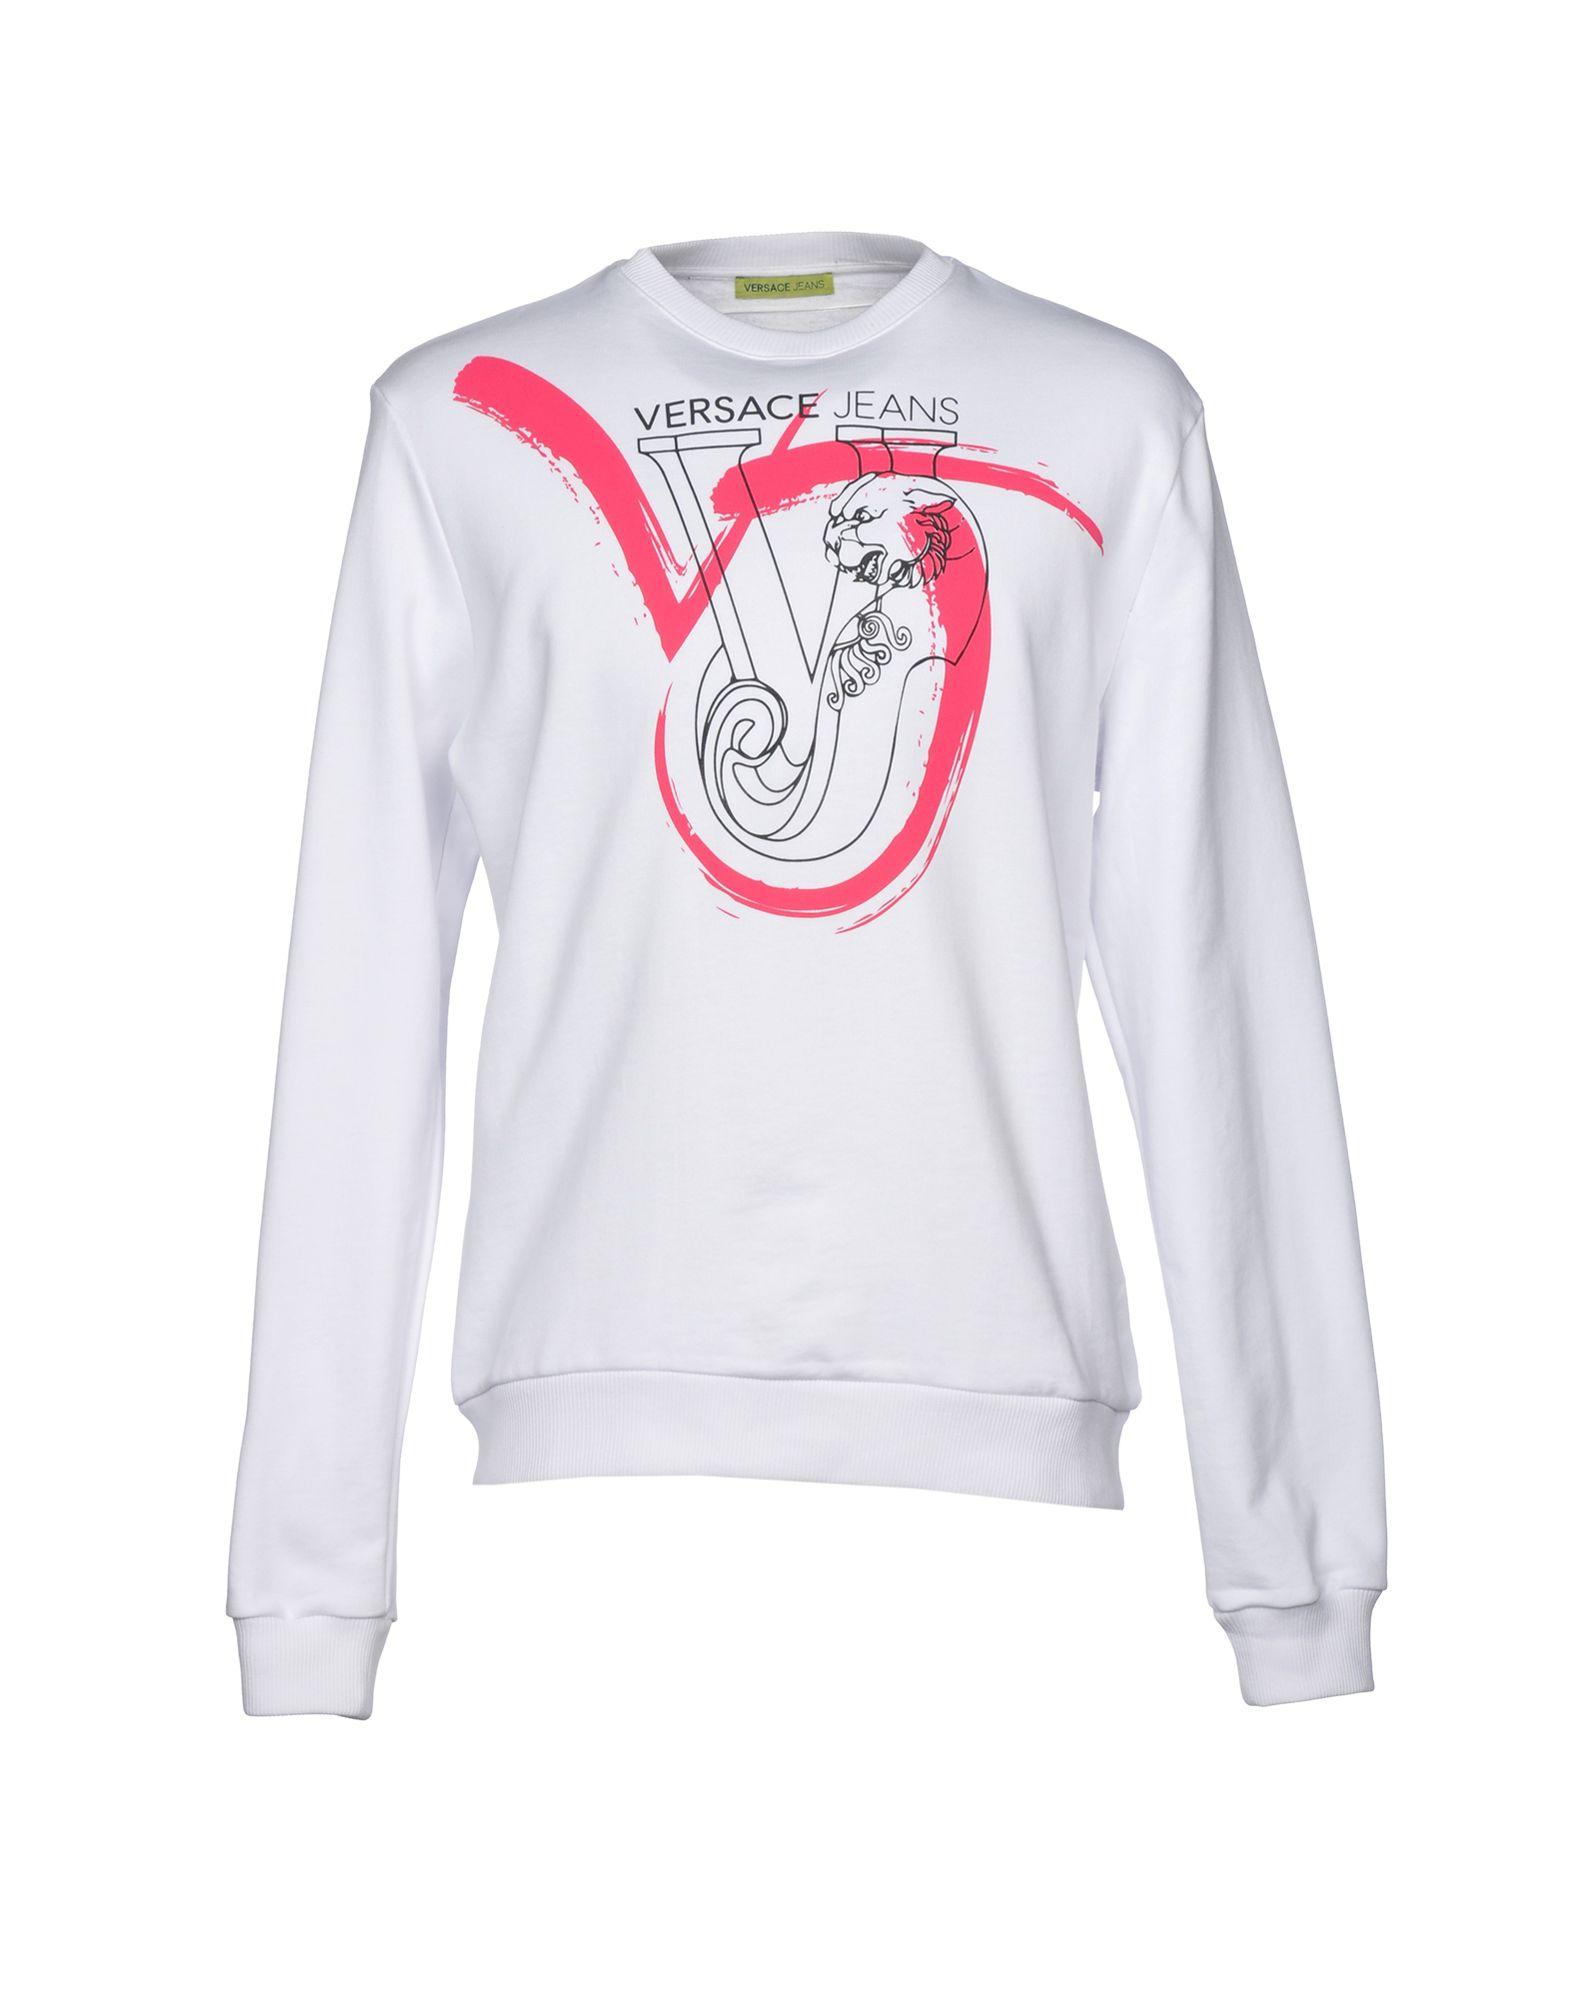 Felpa Versace Jeans Donna - Acquista online su